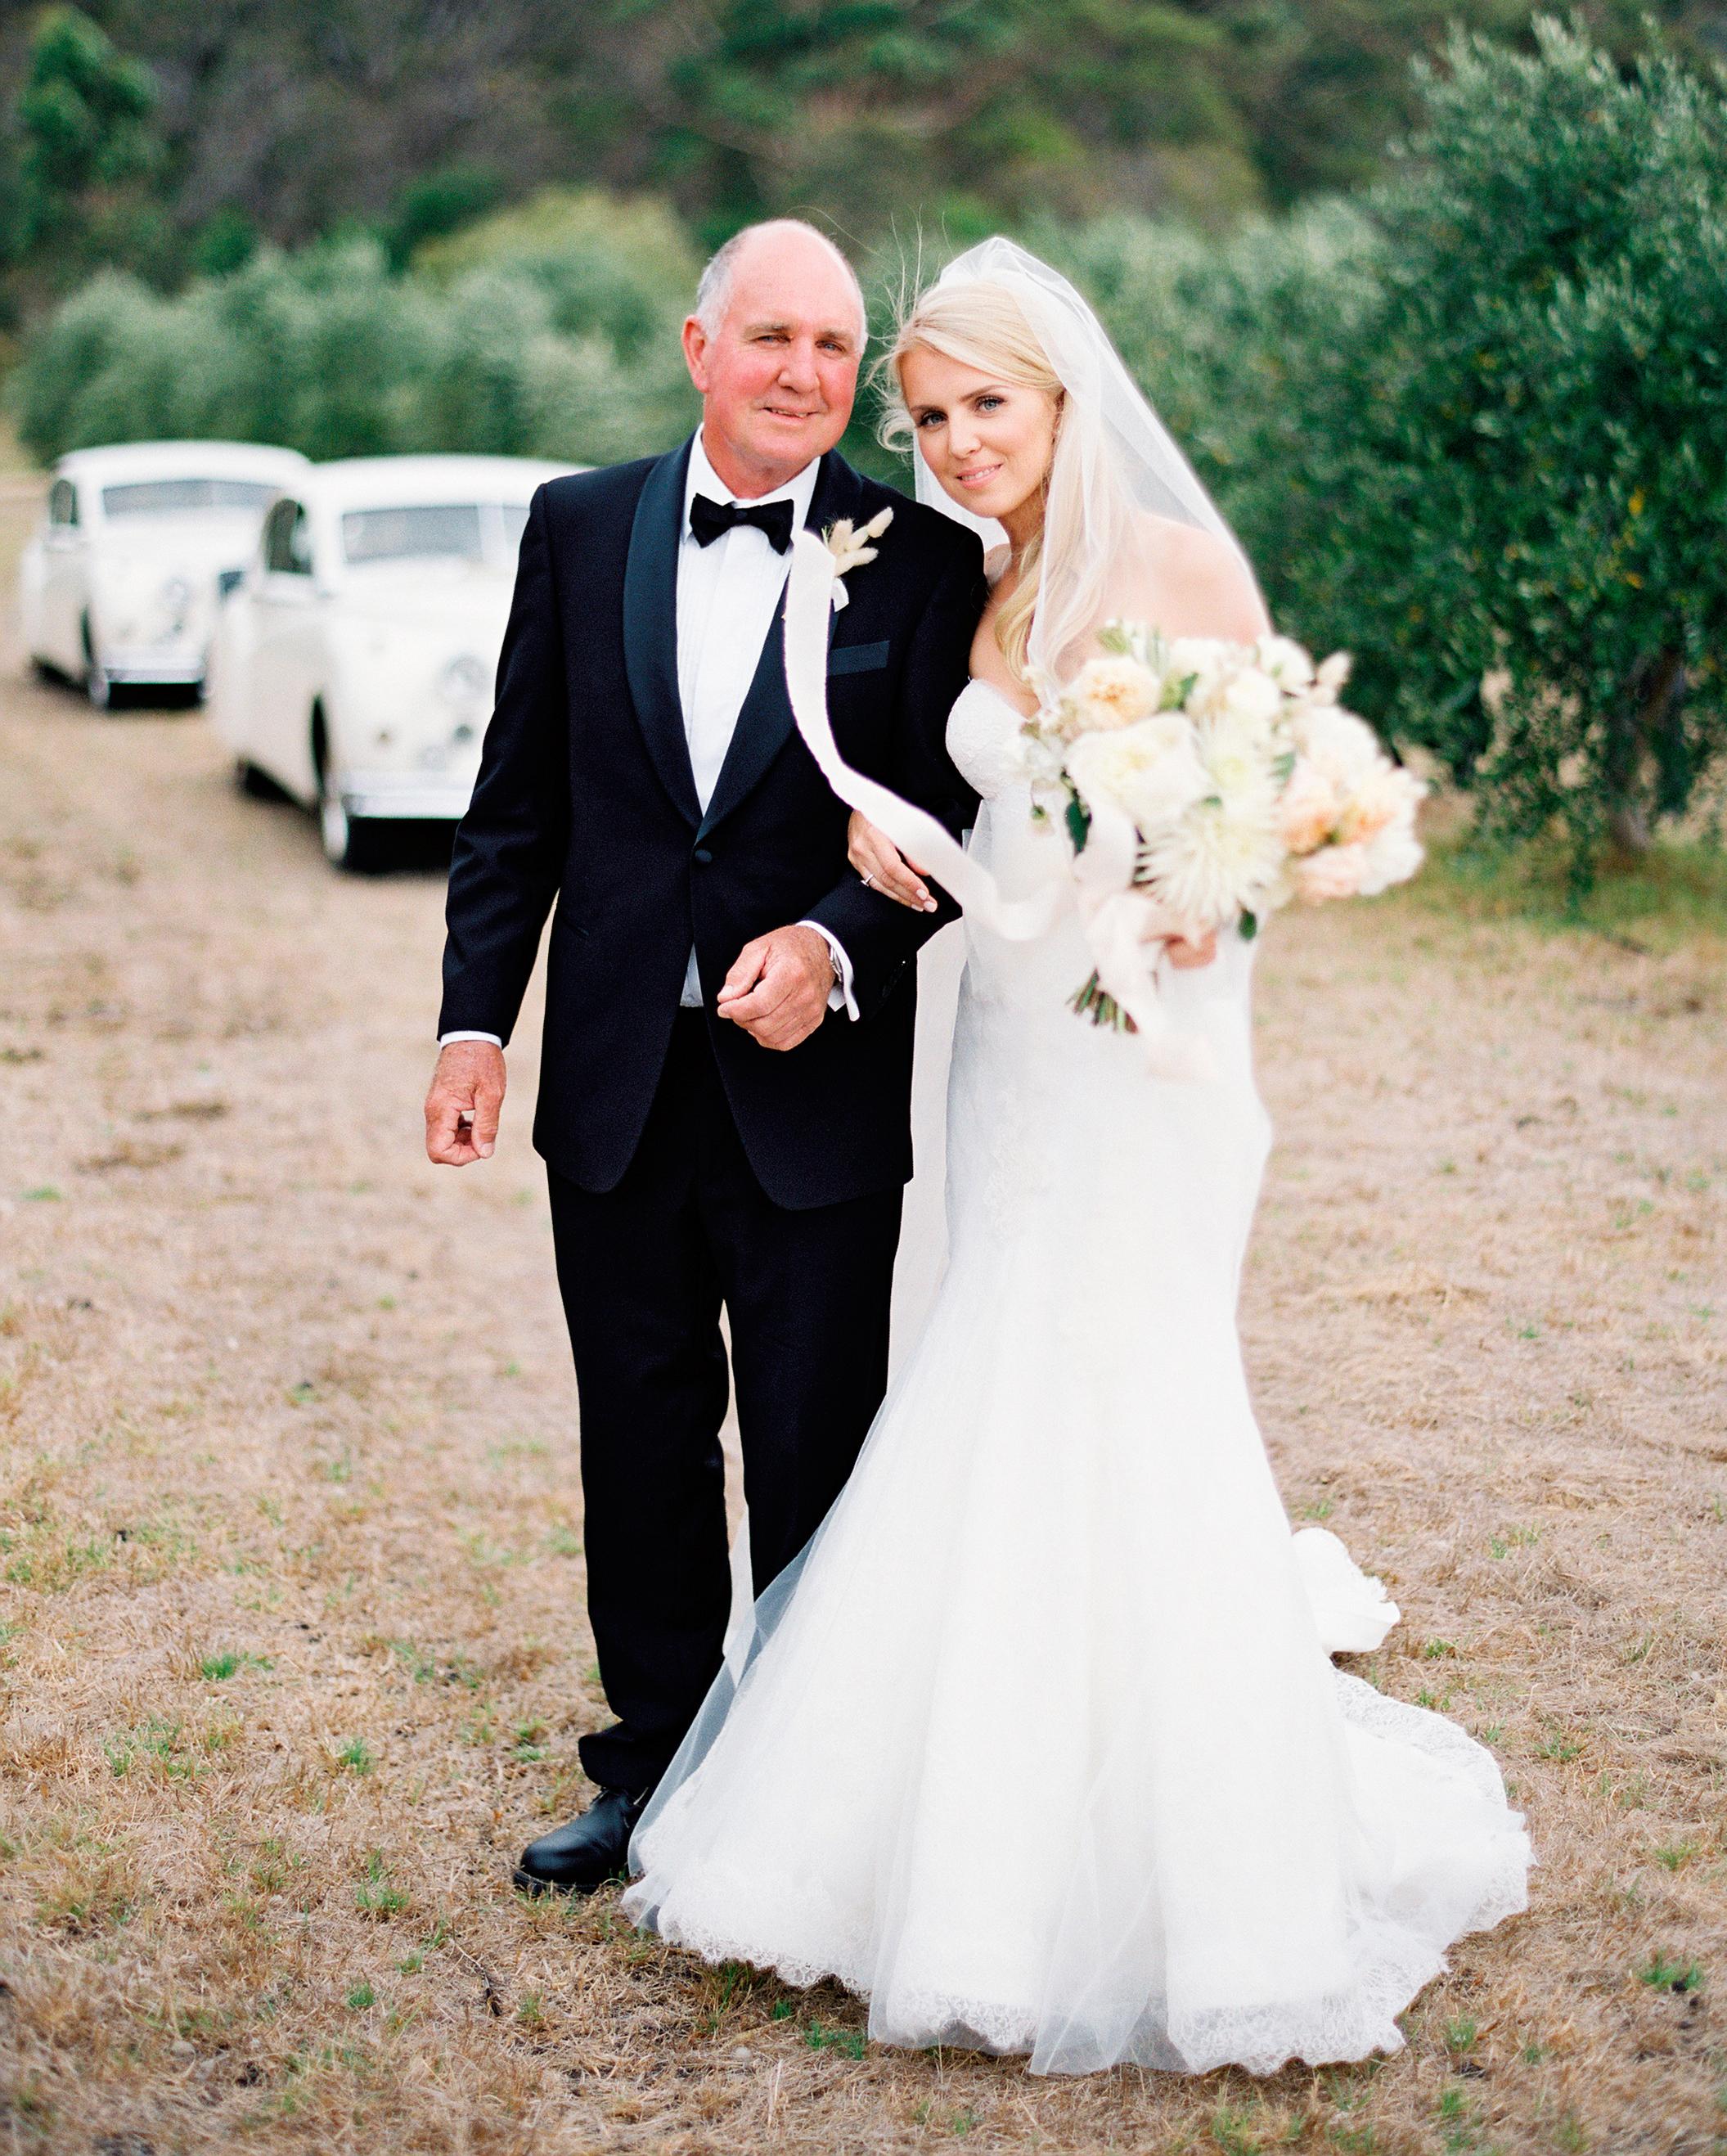 jemma-michael-wedding-dad-002620014-s112110-0815.jpg